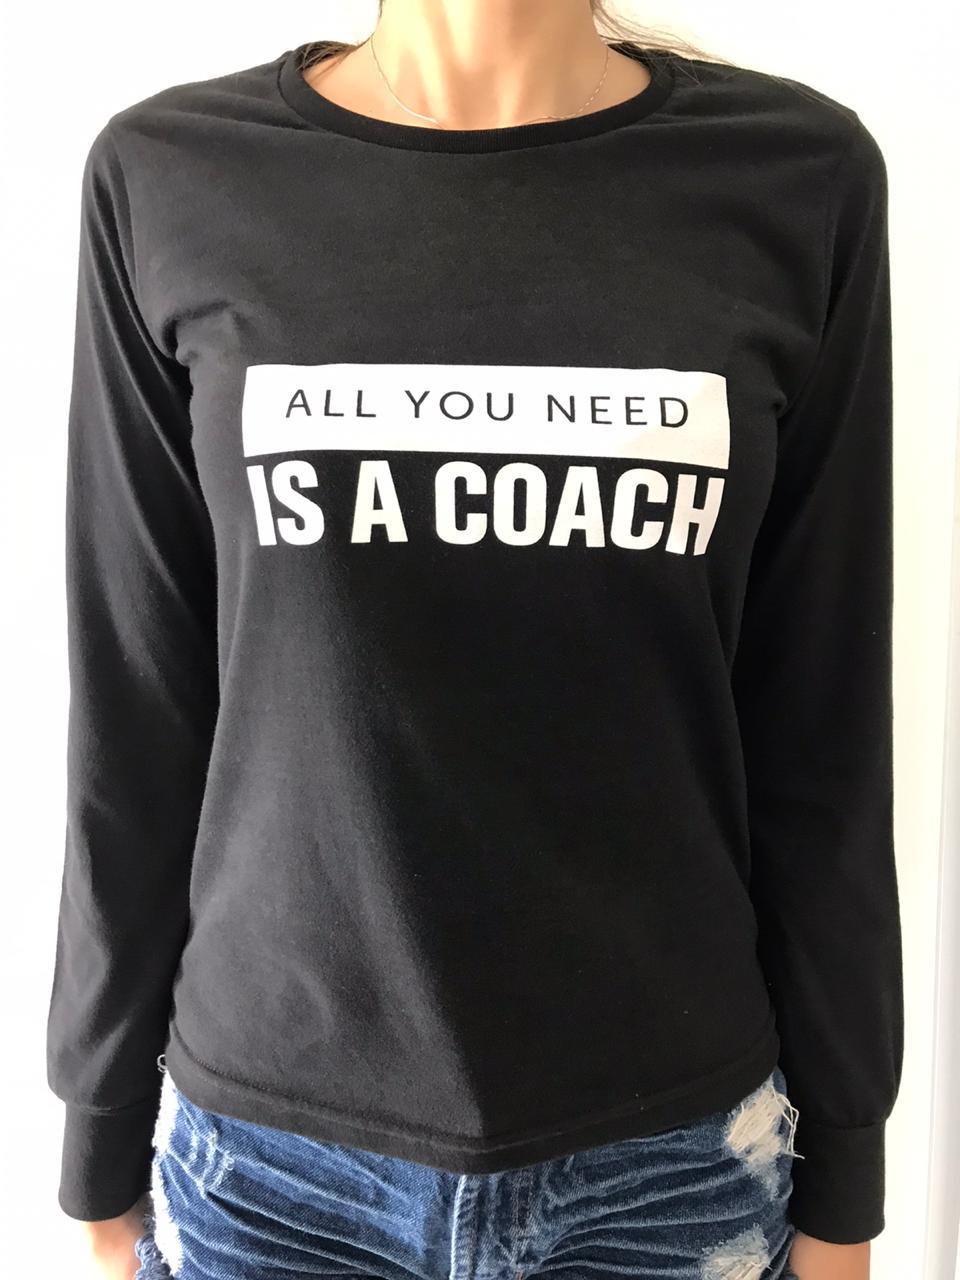 Camiseta Feminina - All you need is a Coach